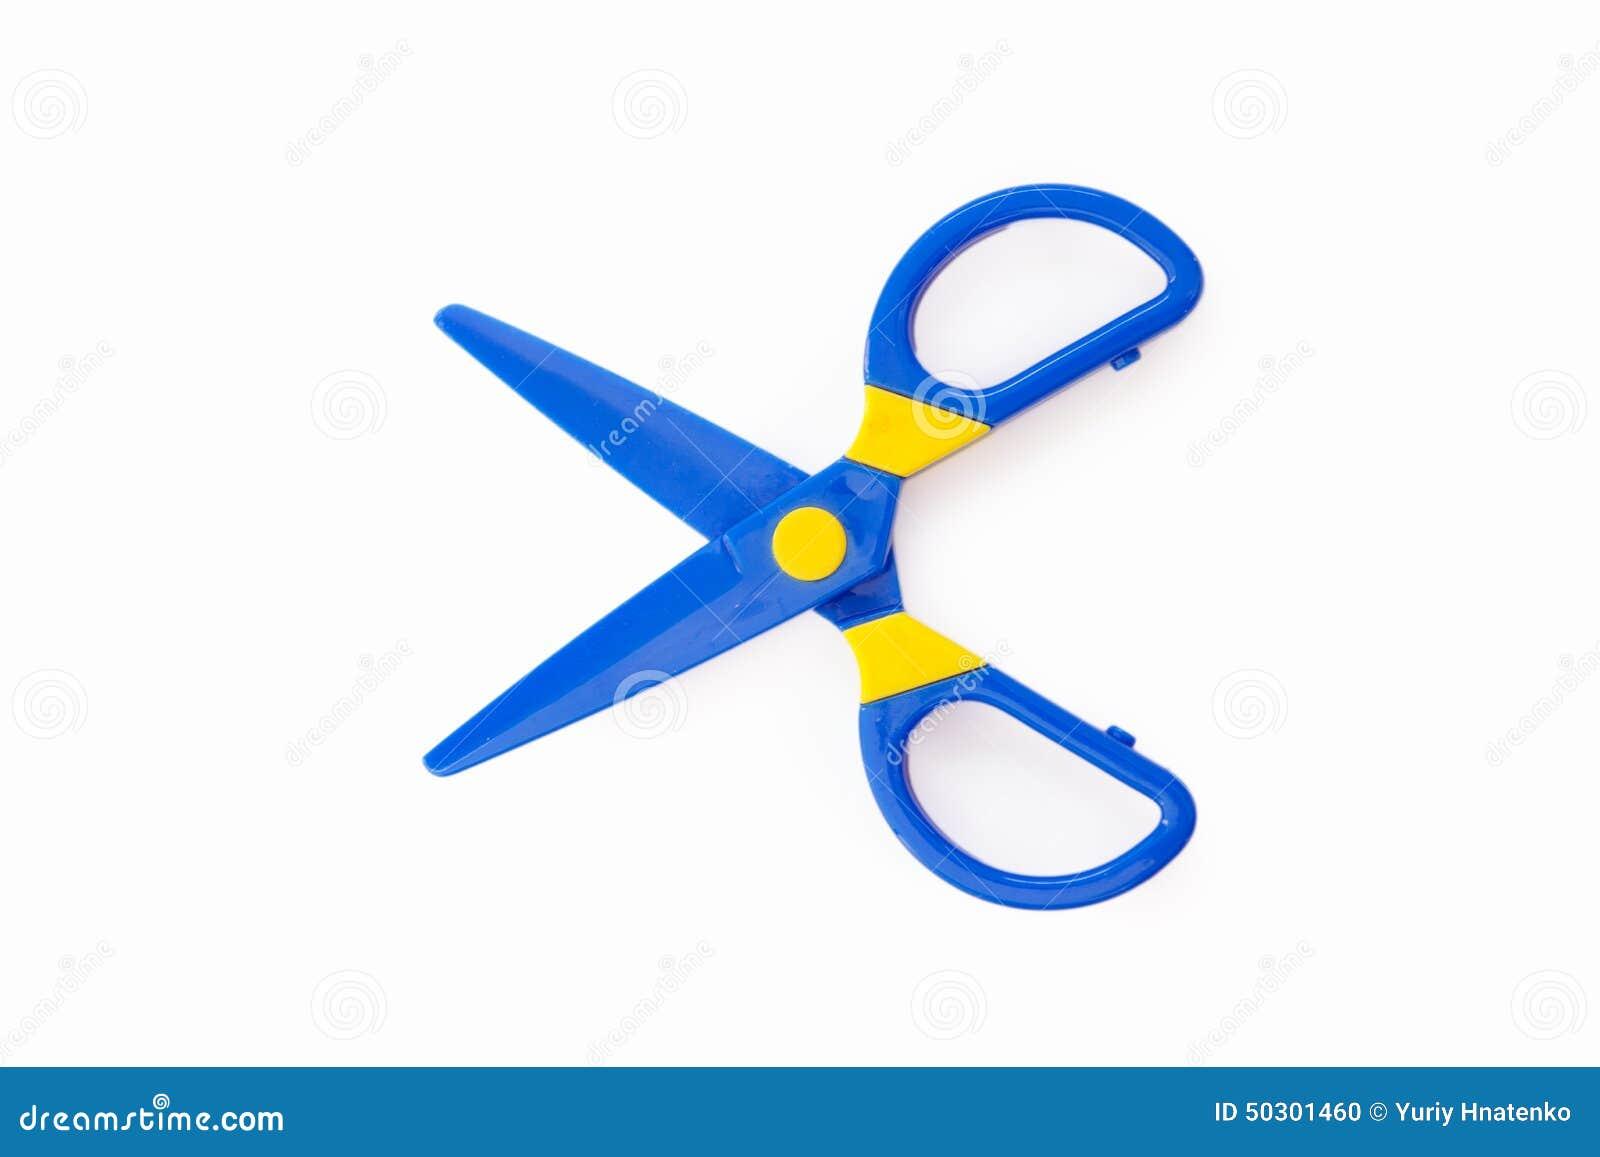 Plastic Scissors Stock Photo Image 50301460